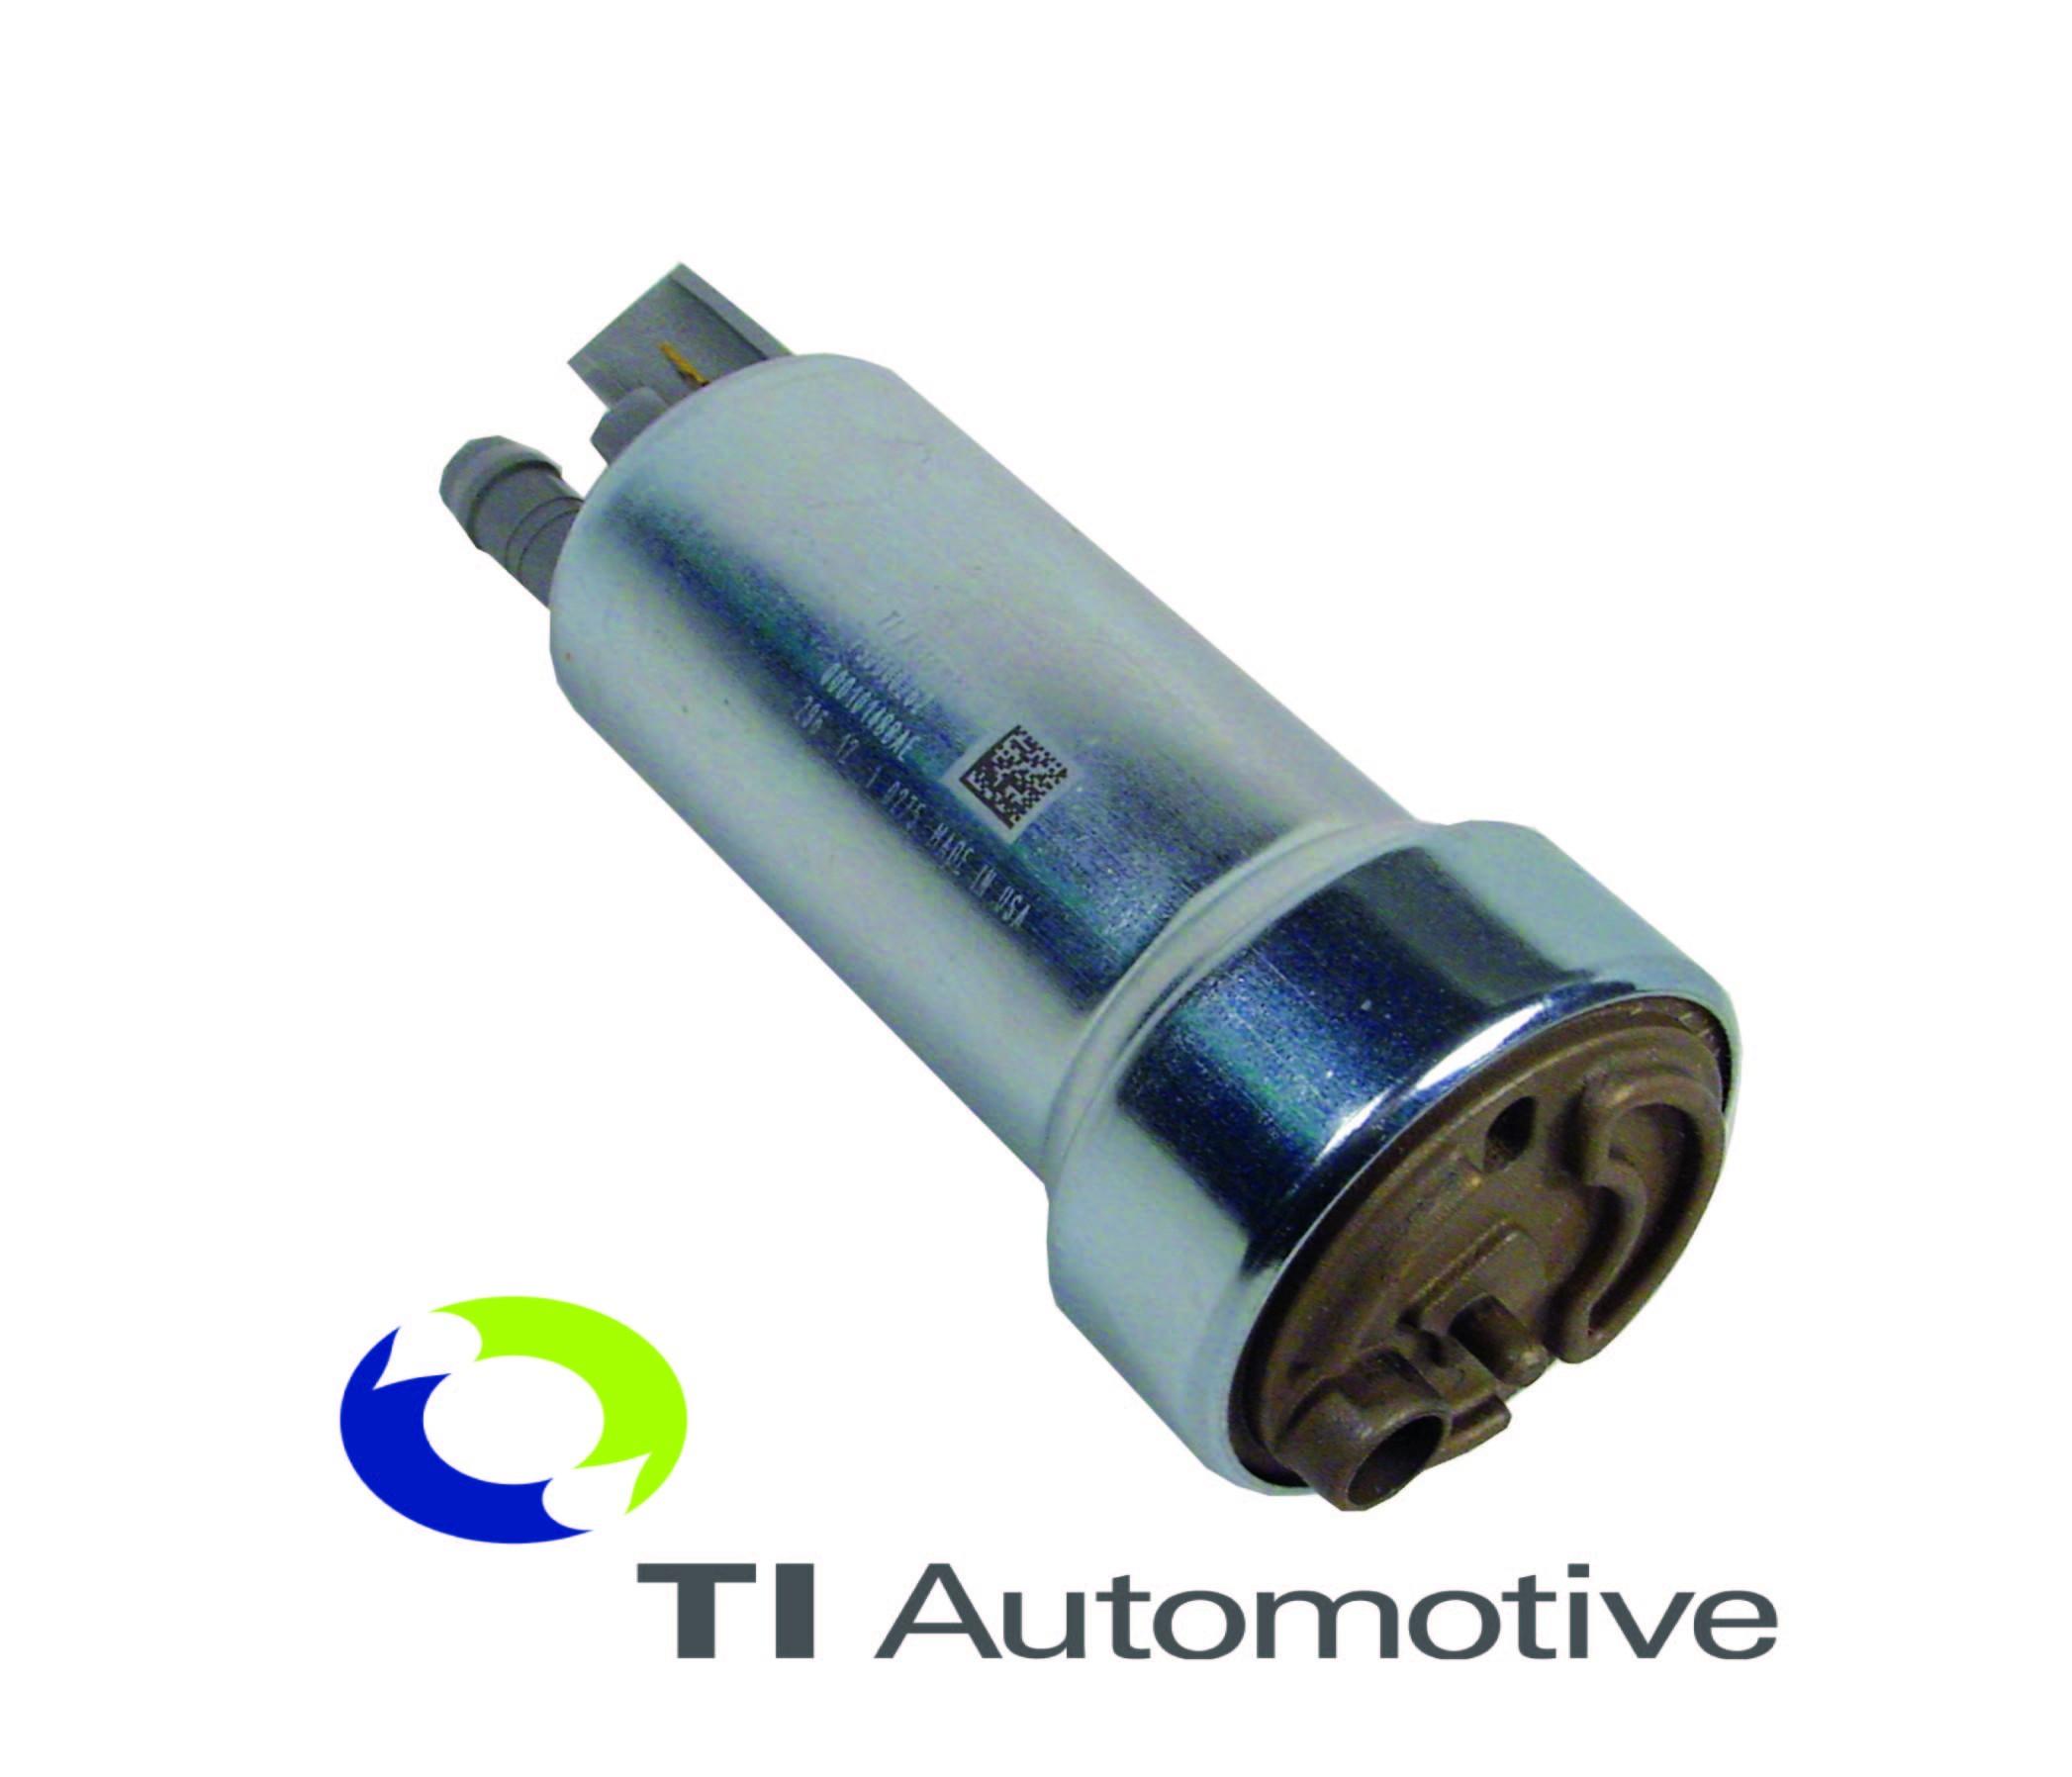 Ti Automotive (Walbro) 400 lph In Tank Motorsport Fuel Pumps